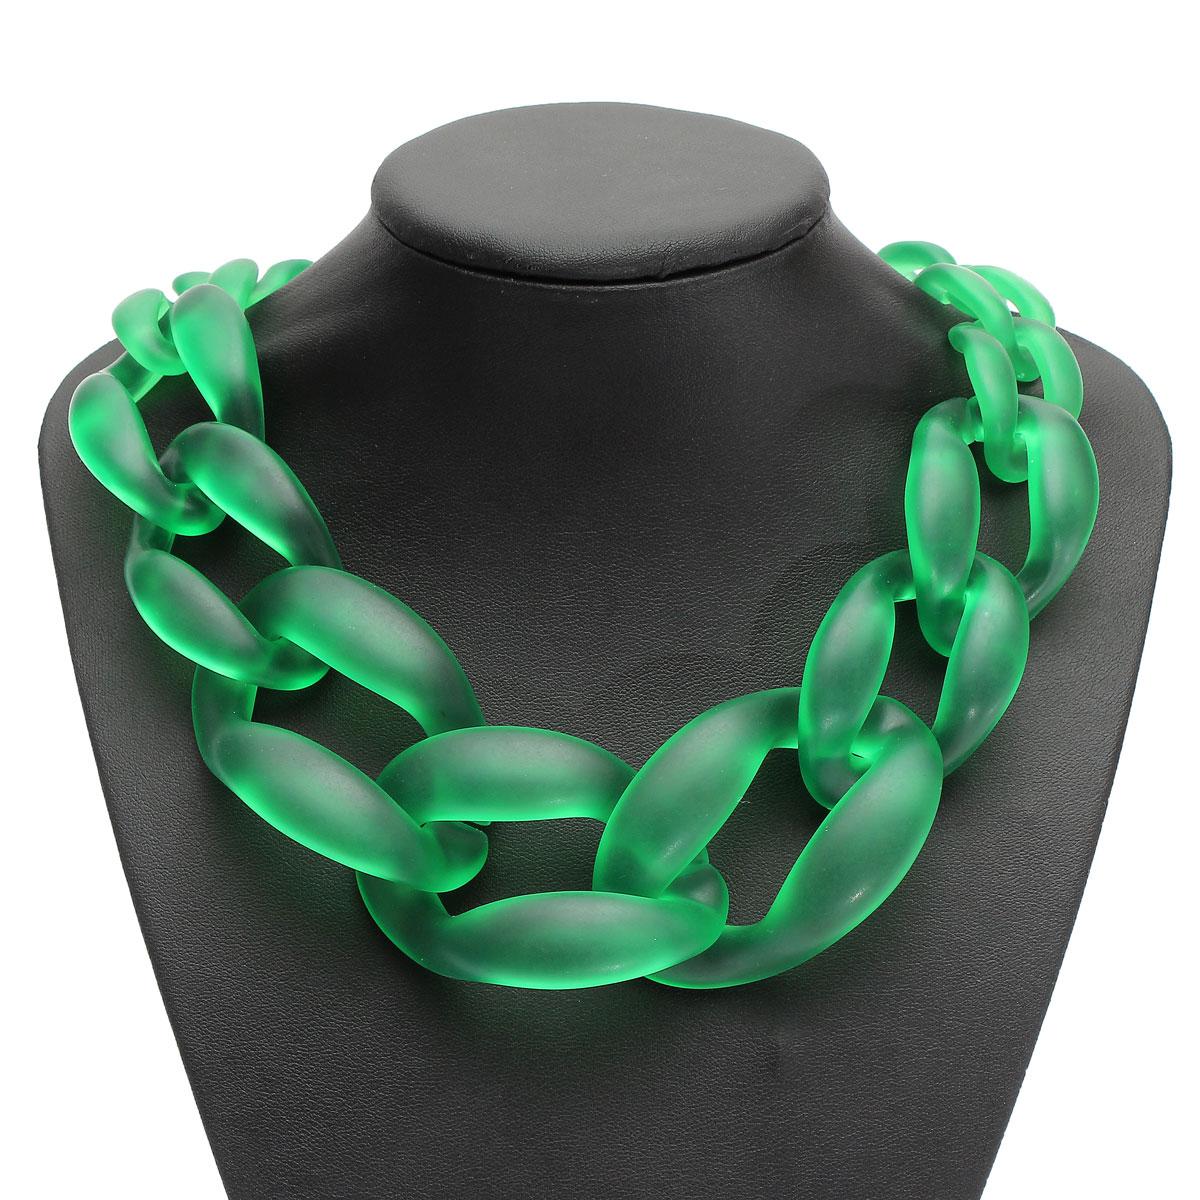 Fashion Lady Jewel Acrylic Collar Chunky Choker Statement Chain Necklace Pendant